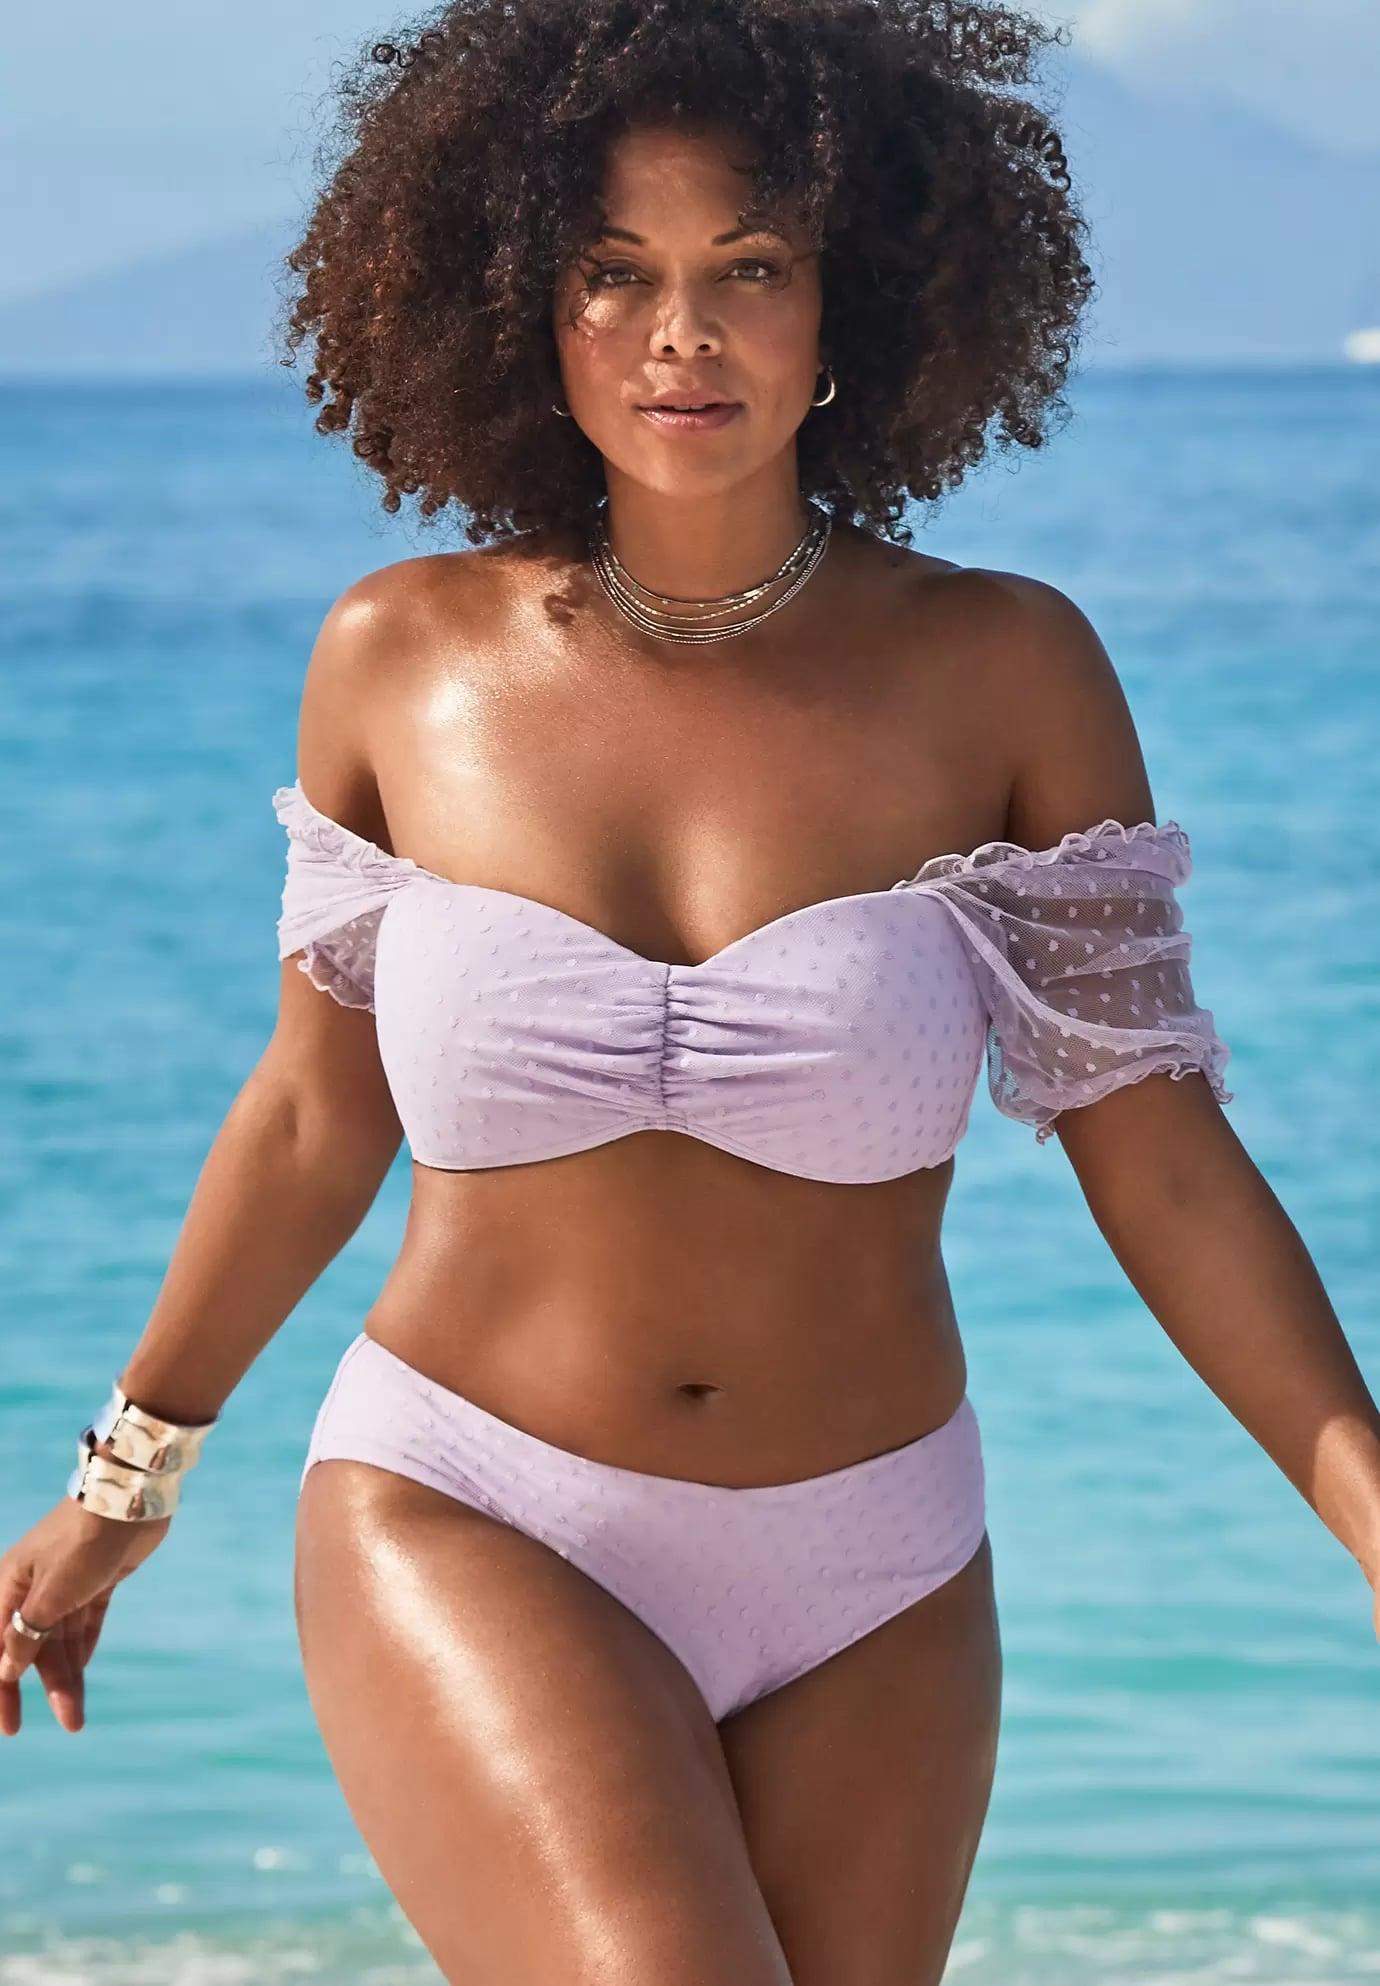 Girls in bikinis with stretch marks Swimwear That Hides Stretch Marks Popsugar Fashion